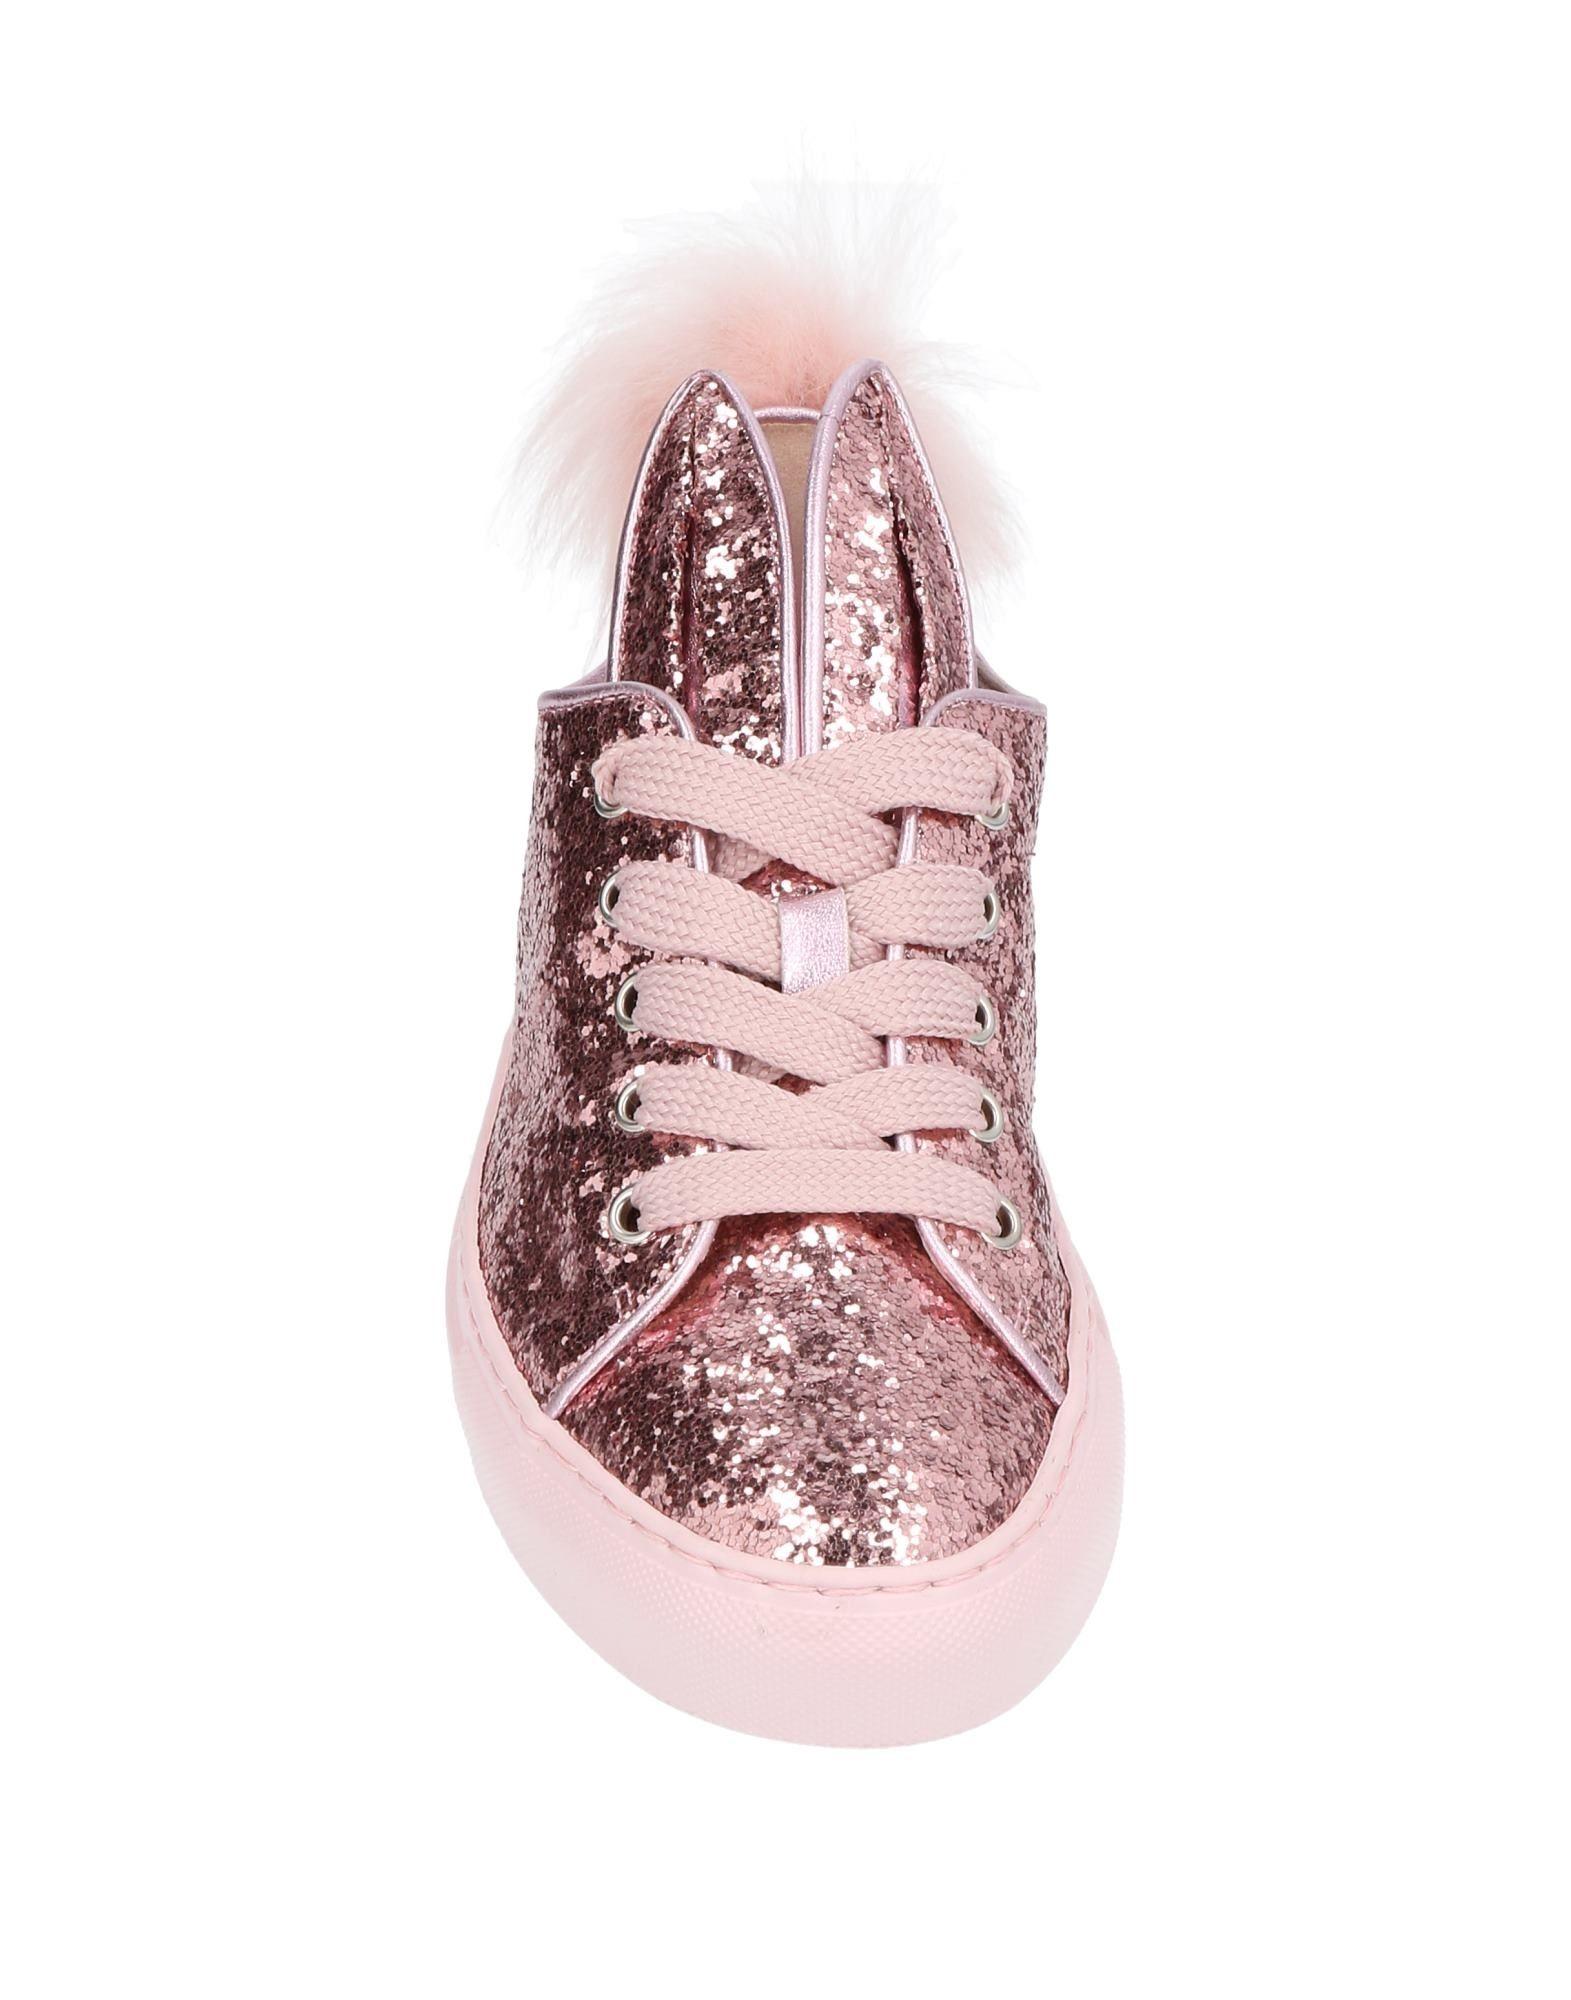 Stilvolle Sneakers billige Schuhe Minna Parikka Sneakers Stilvolle Damen  11461227LS 964934